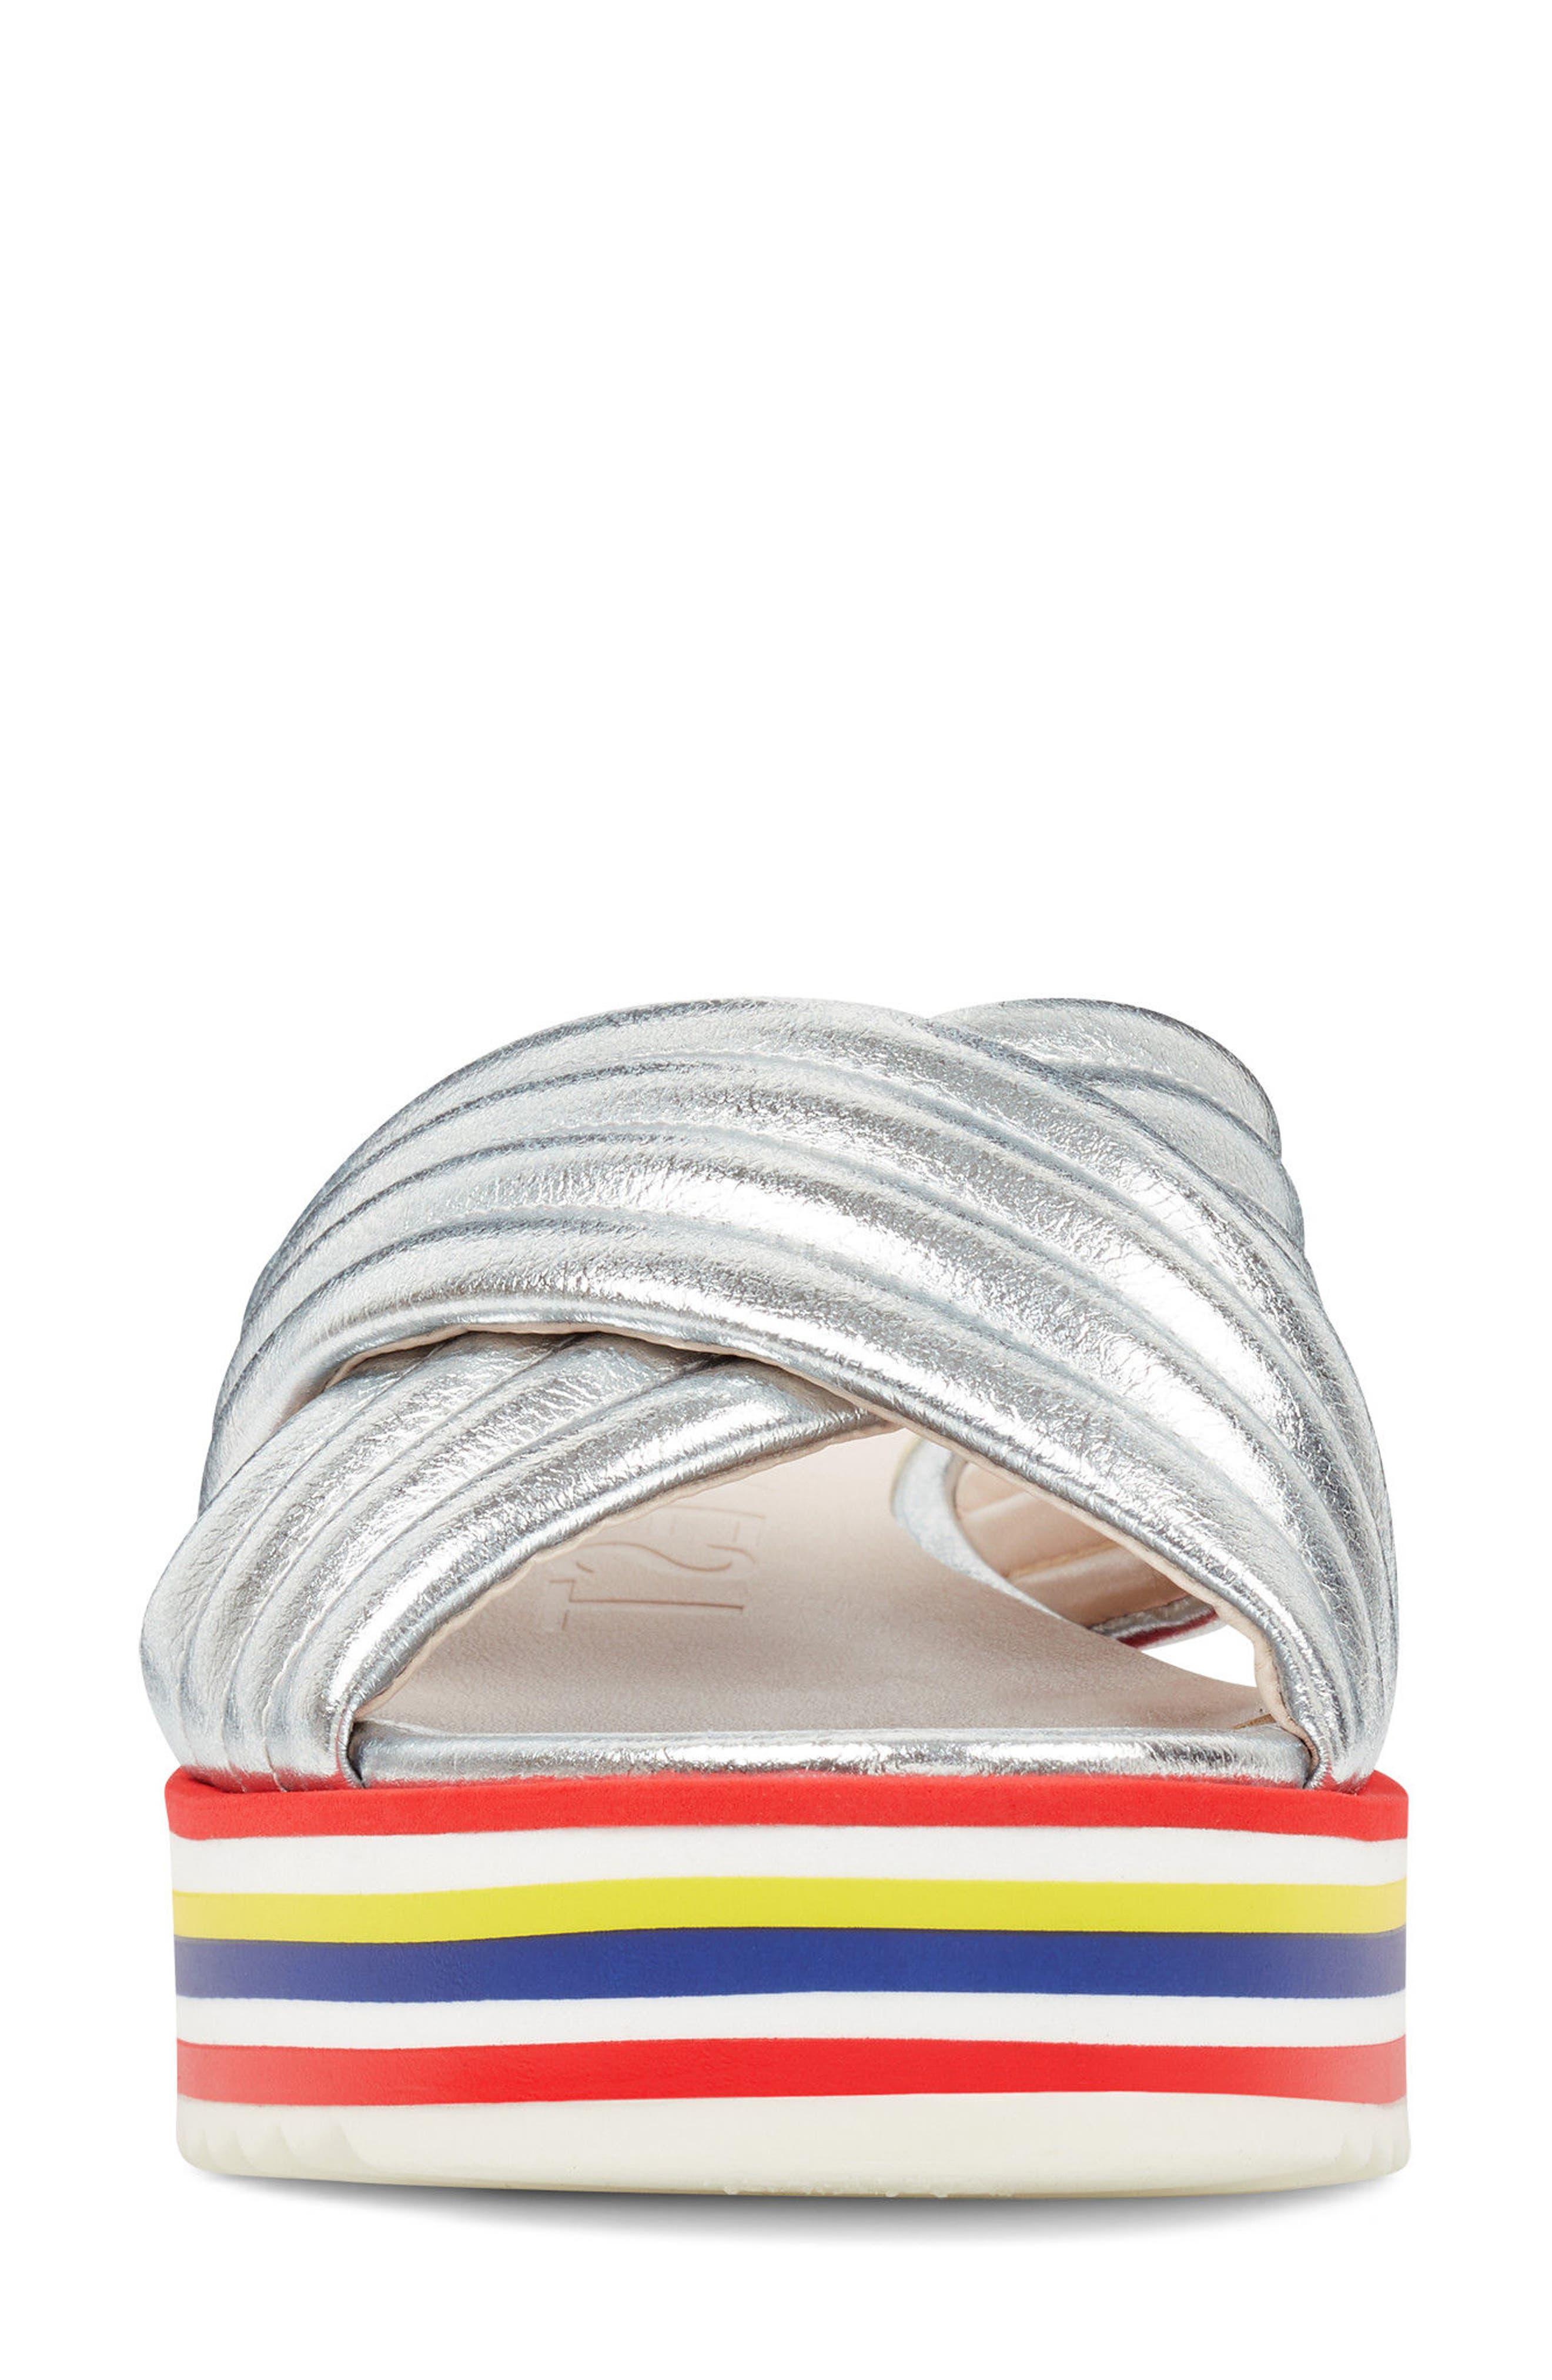 Zonita Platform Slide Sandal,                             Alternate thumbnail 4, color,                             Silver Faux Leather